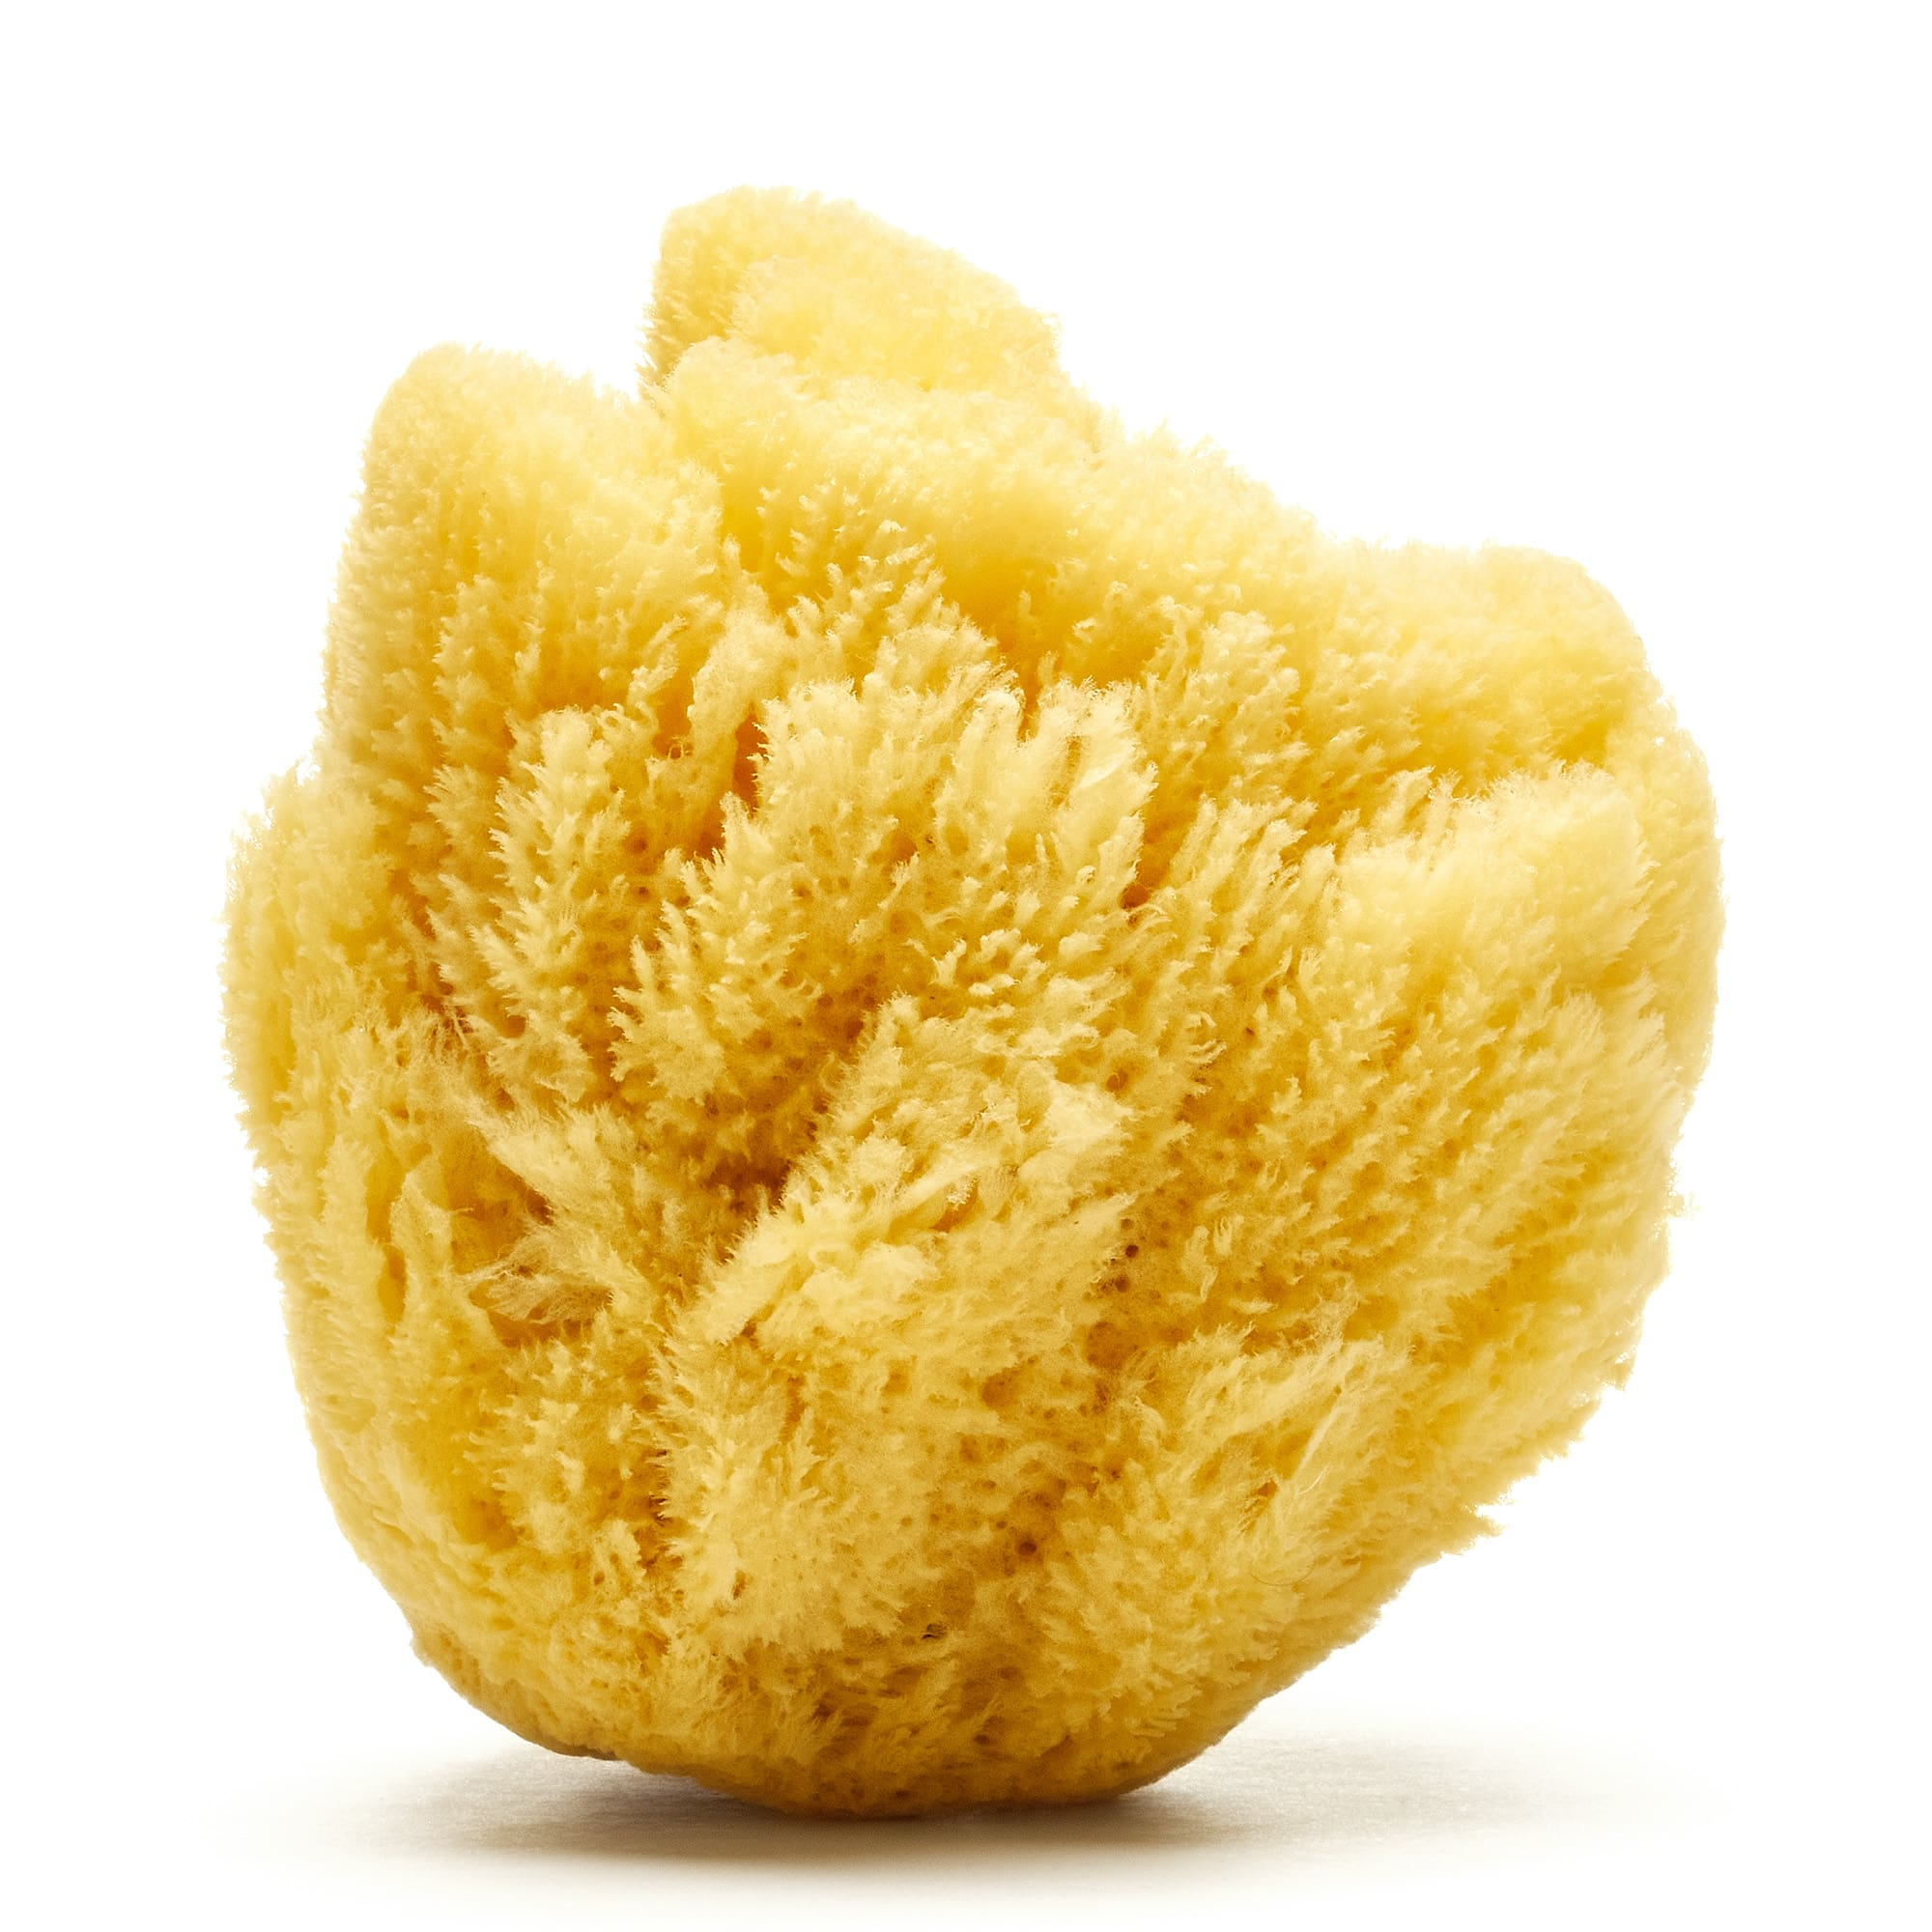 Grass Caribbean sponge (Bleached) 2